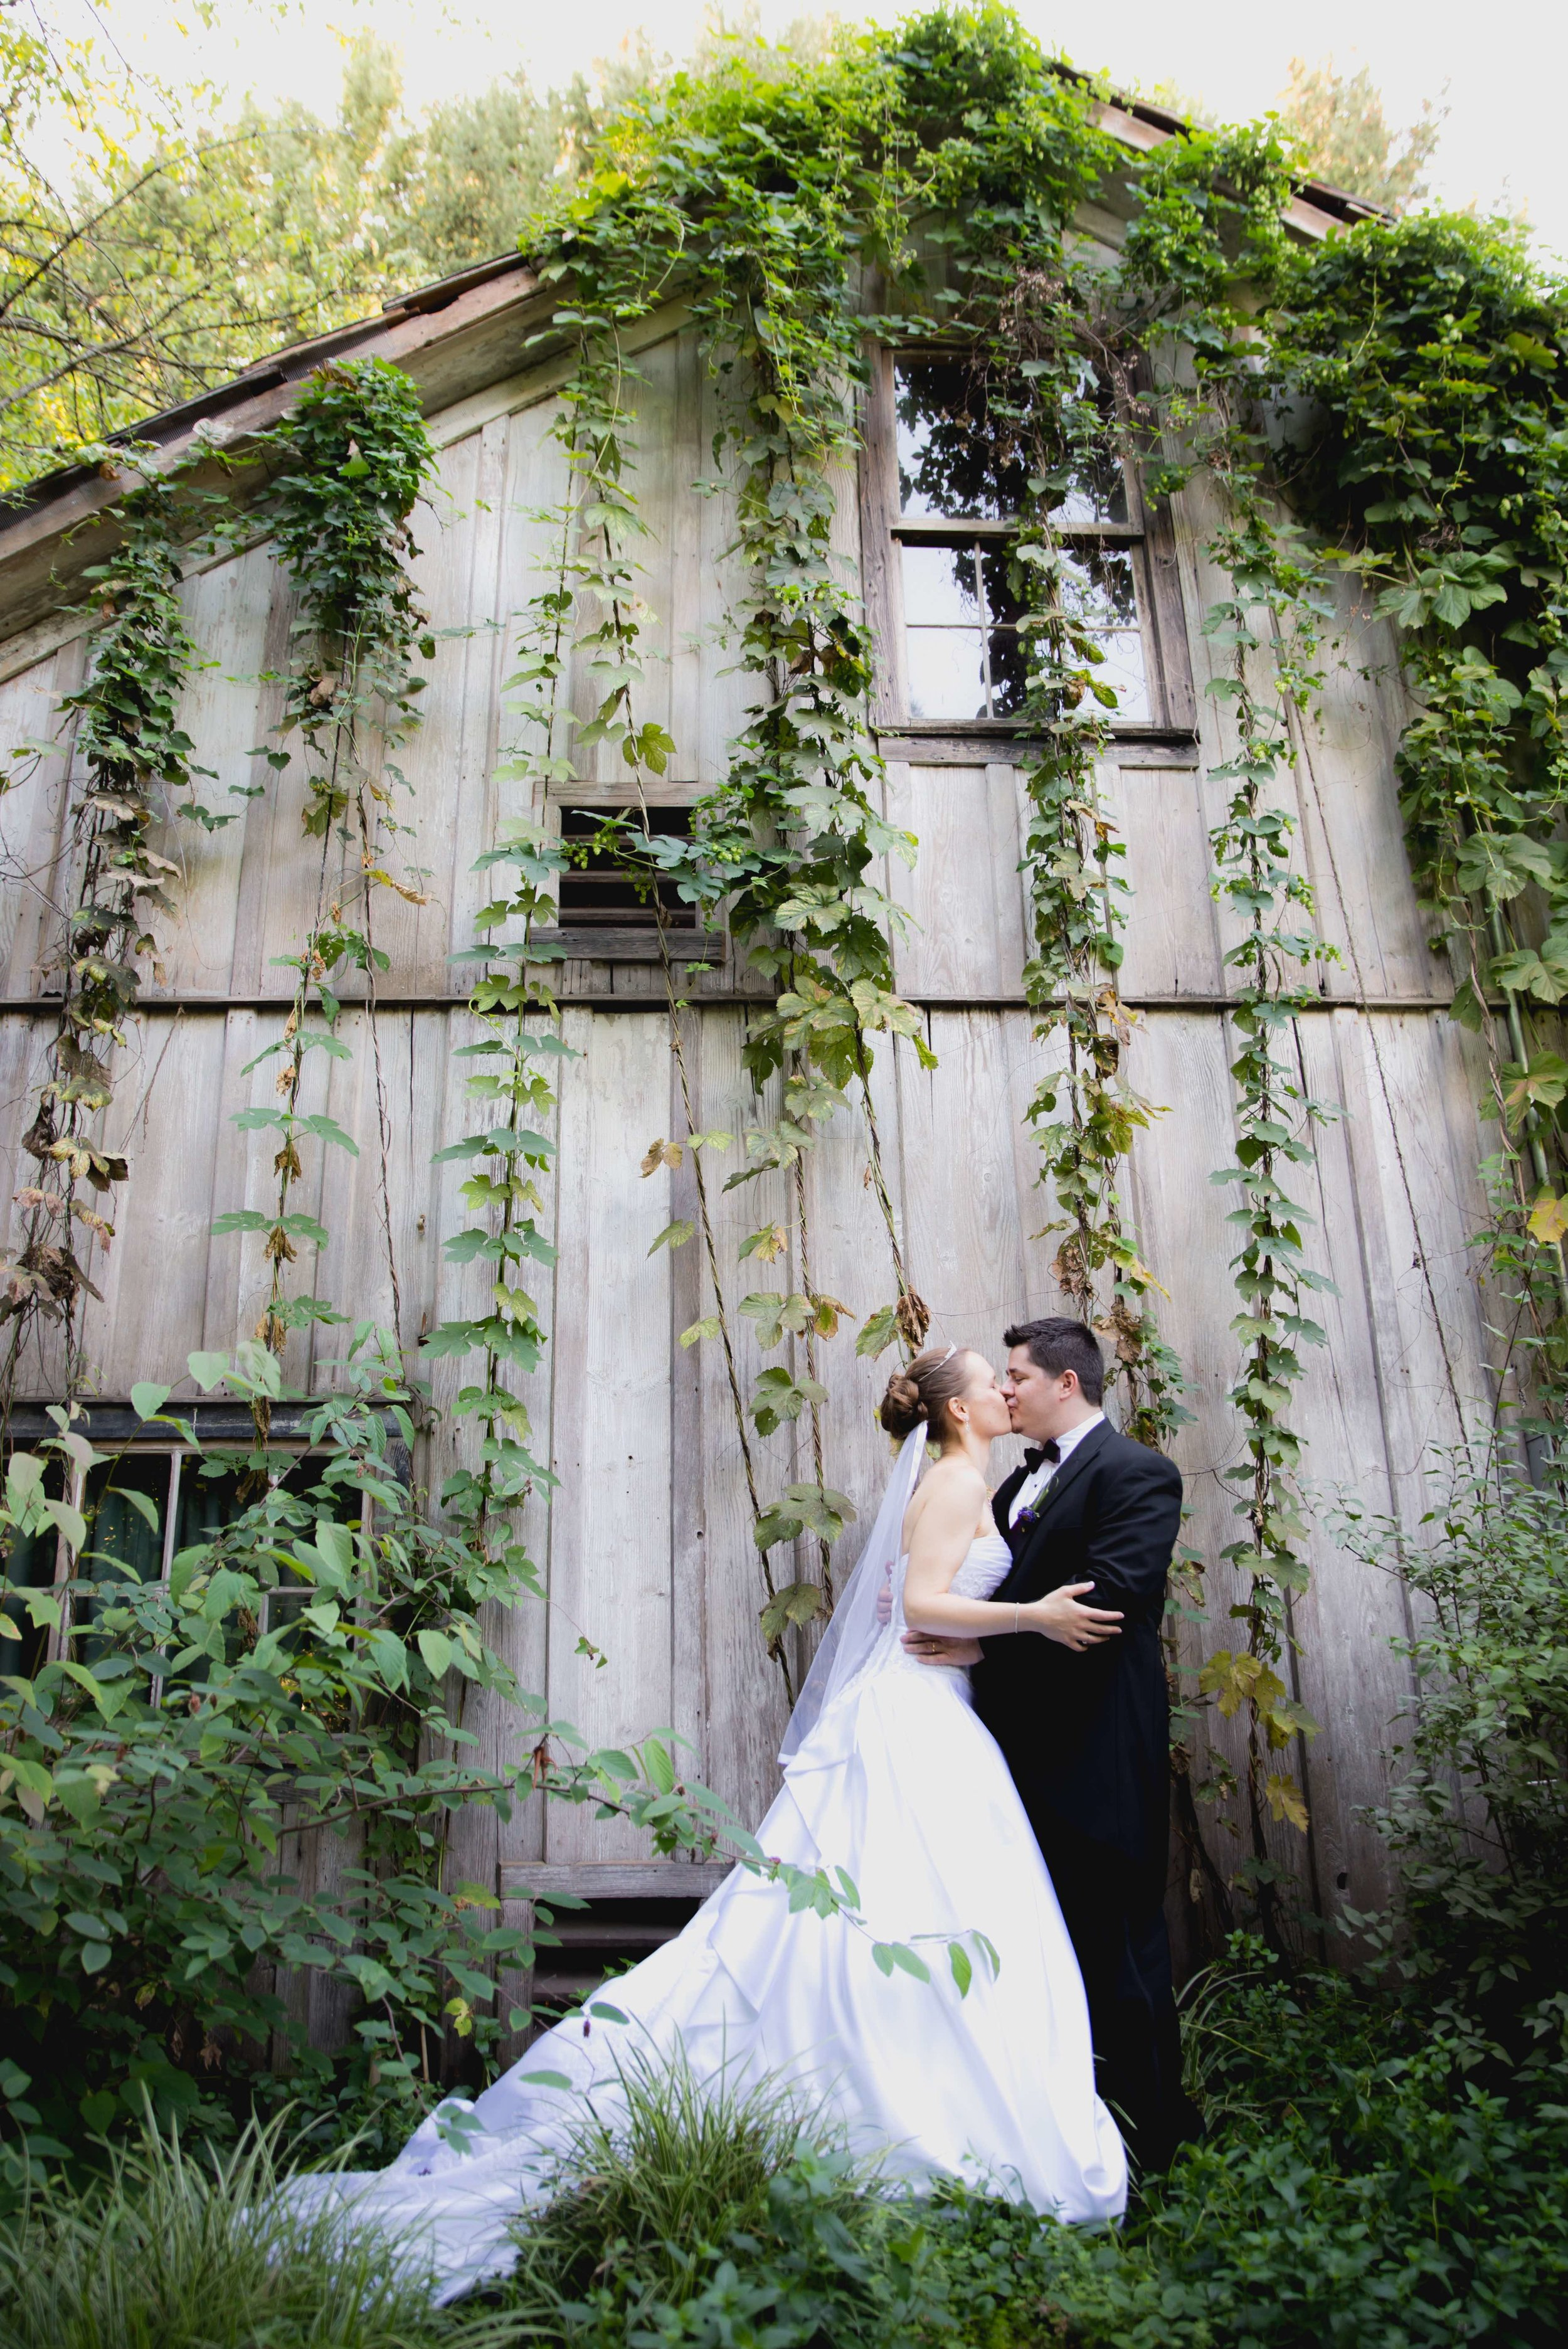 anthony_wedding_website (1 of 1)-9.jpg